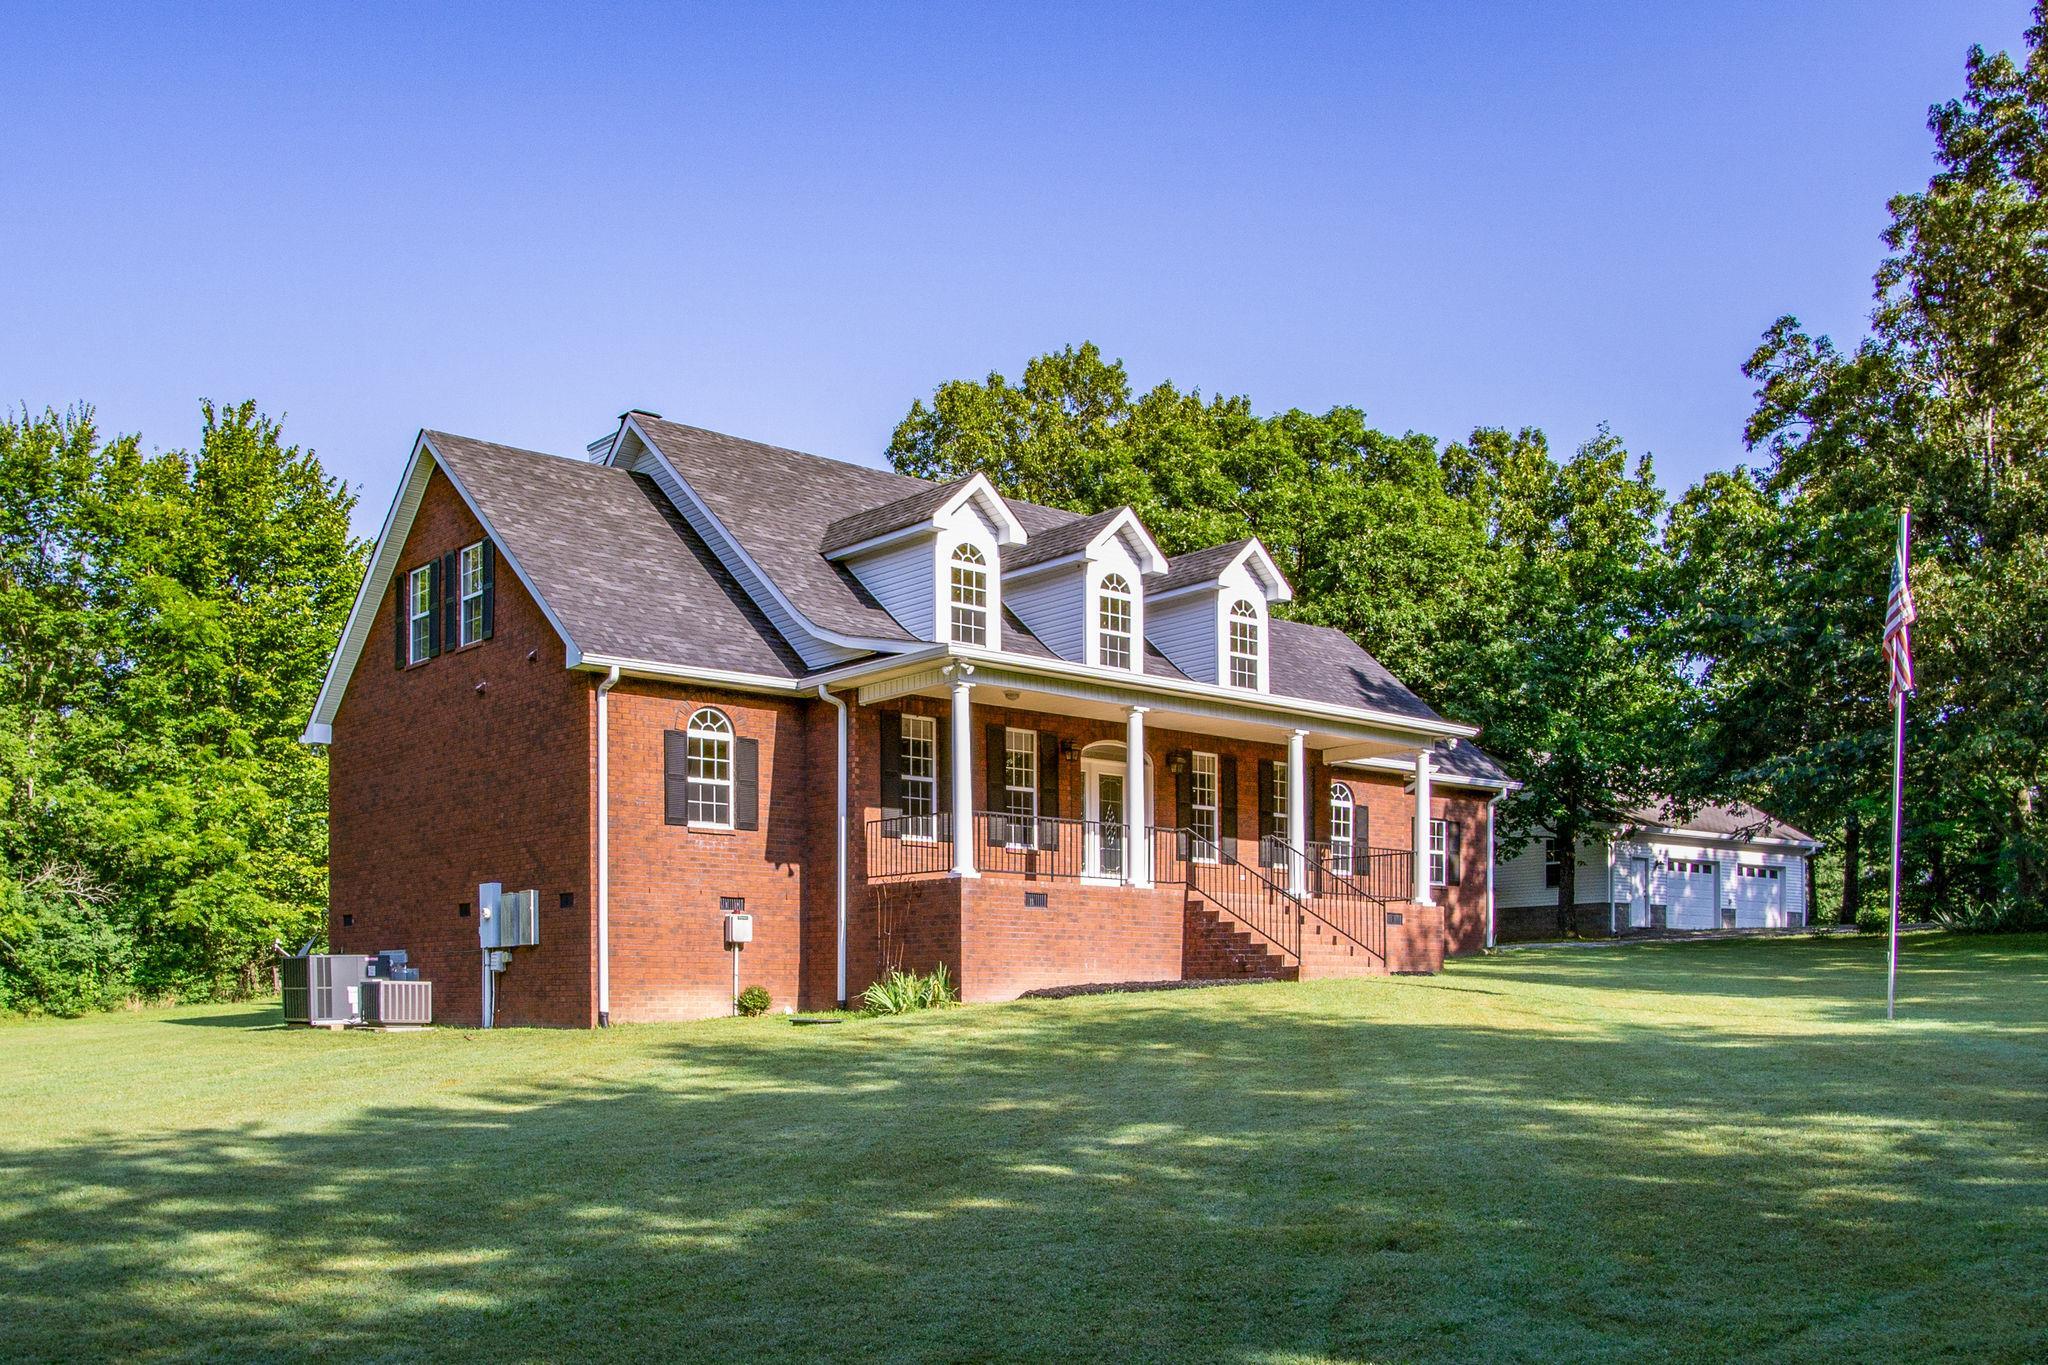 7109 Harrison Drive, Fairview, TN 37062 - Fairview, TN real estate listing